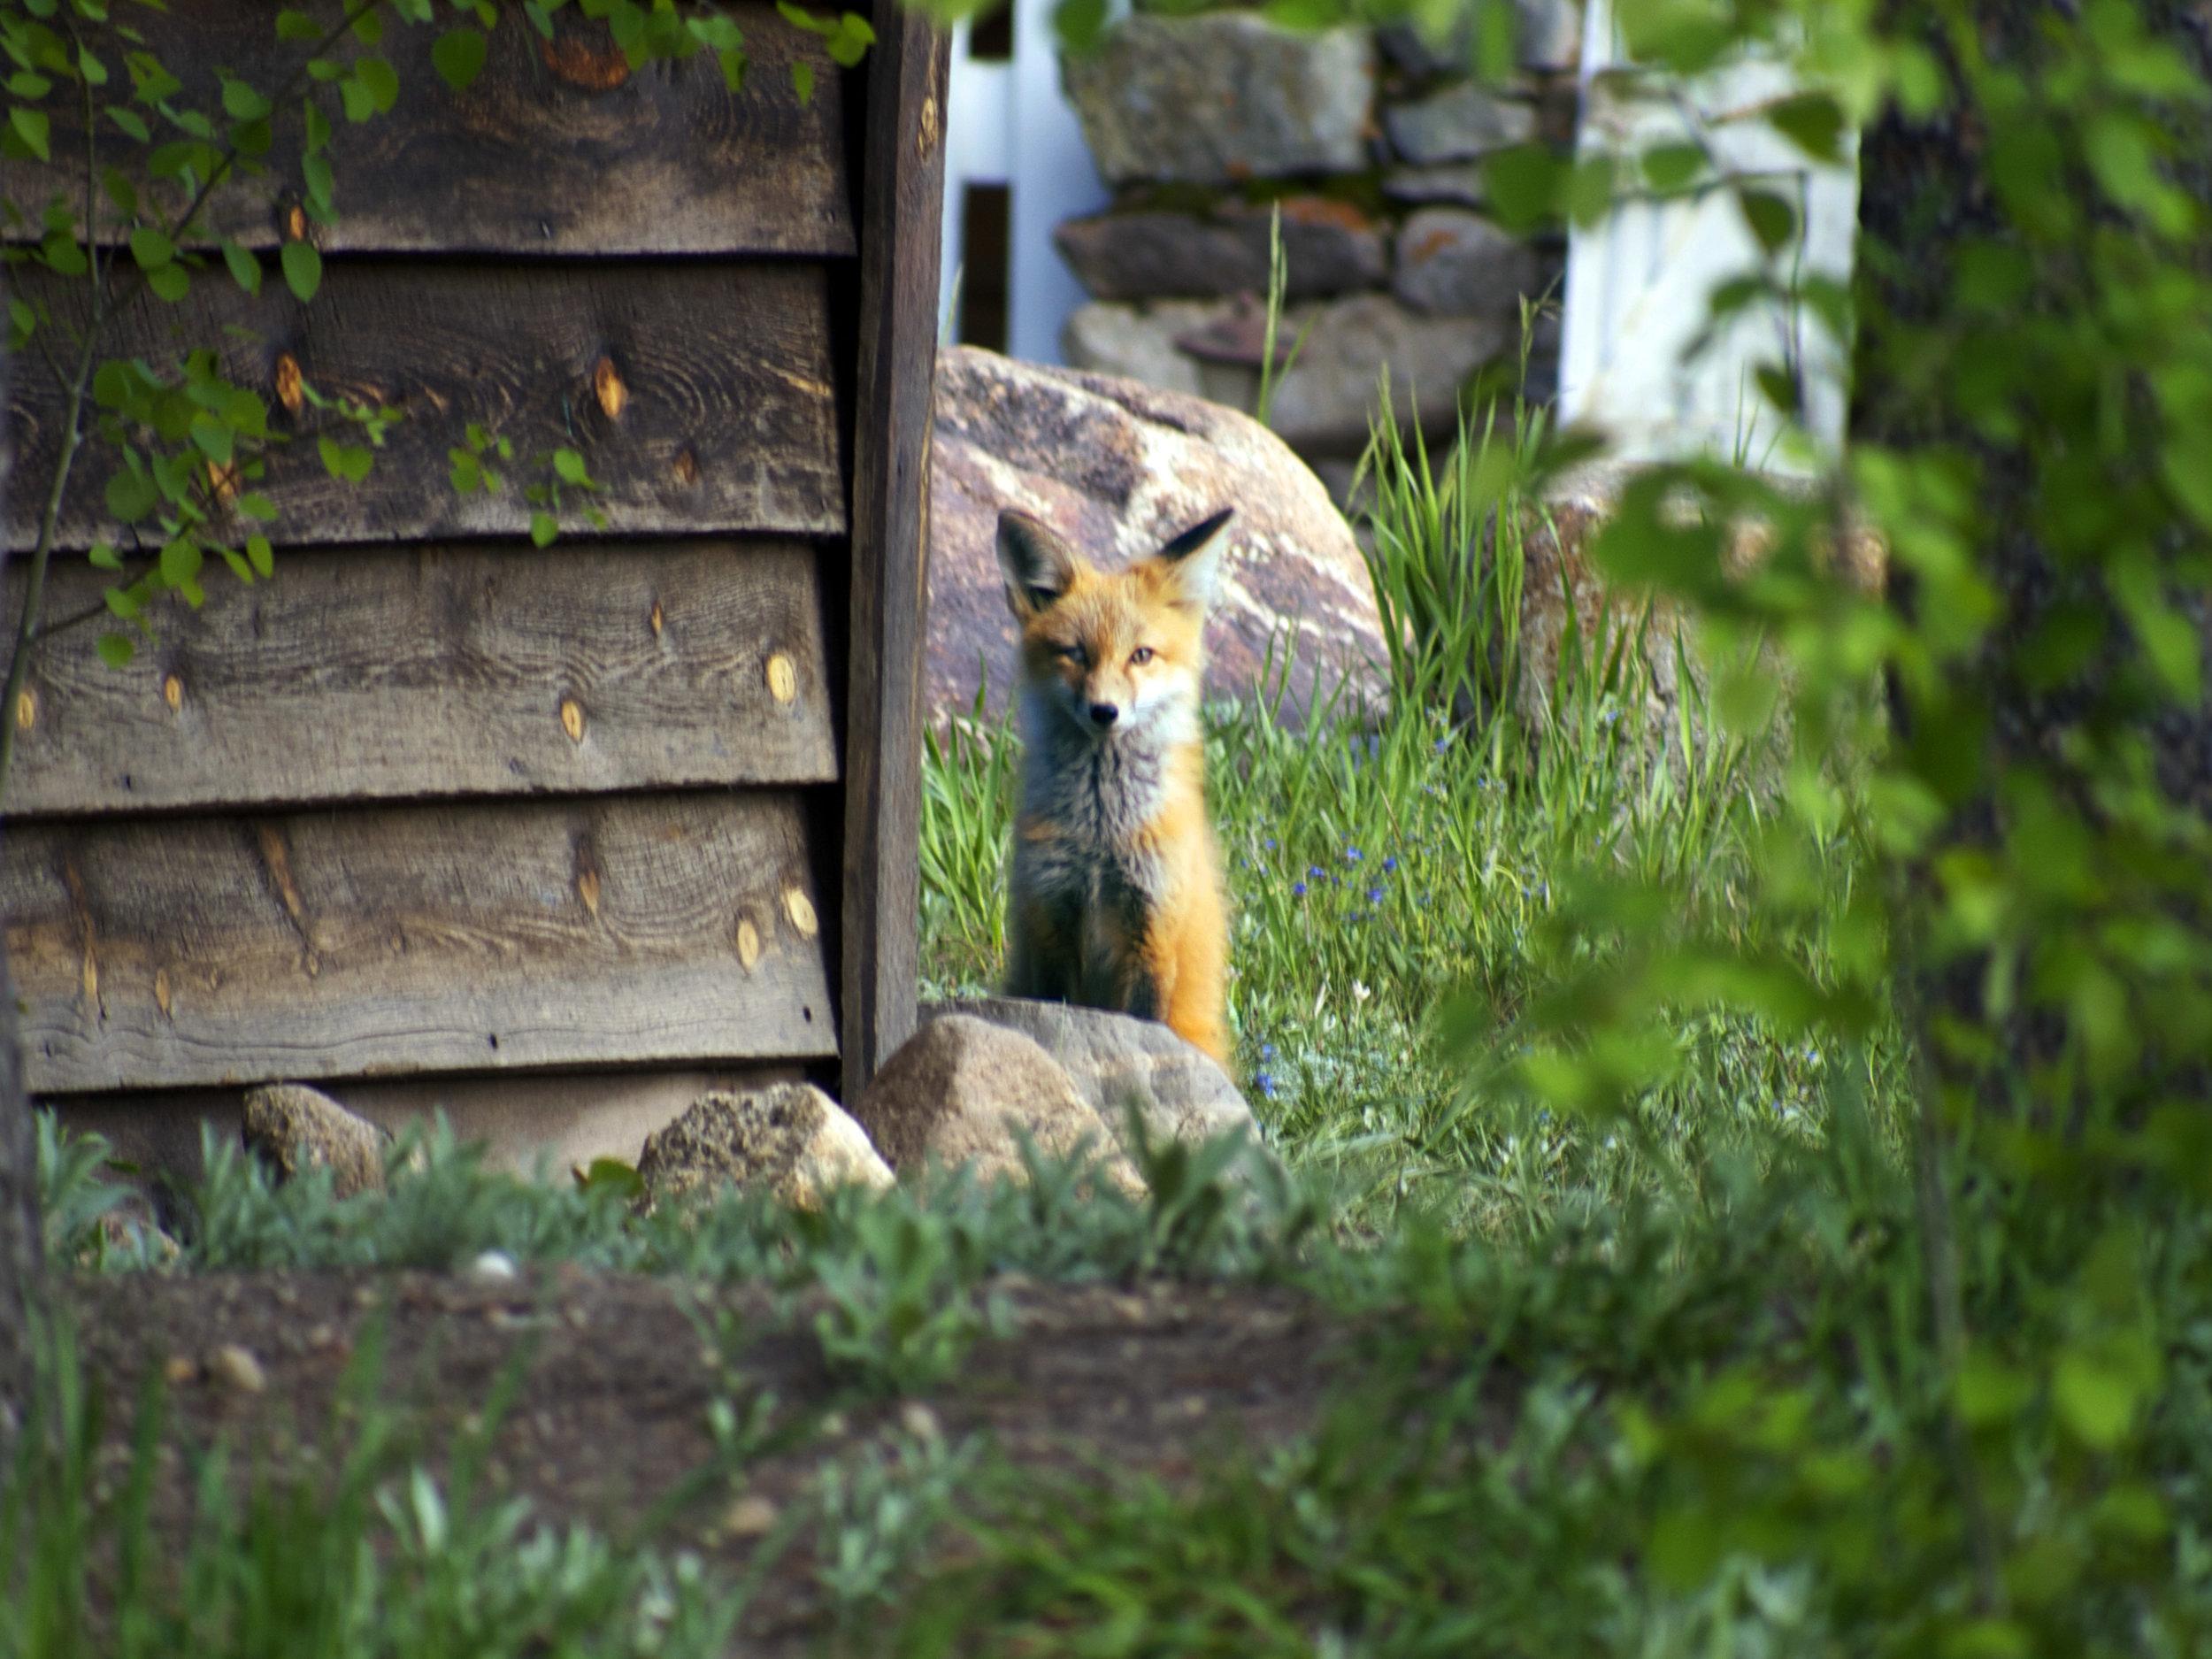 Fox, Nederland, Co - Photo by Tim Giller